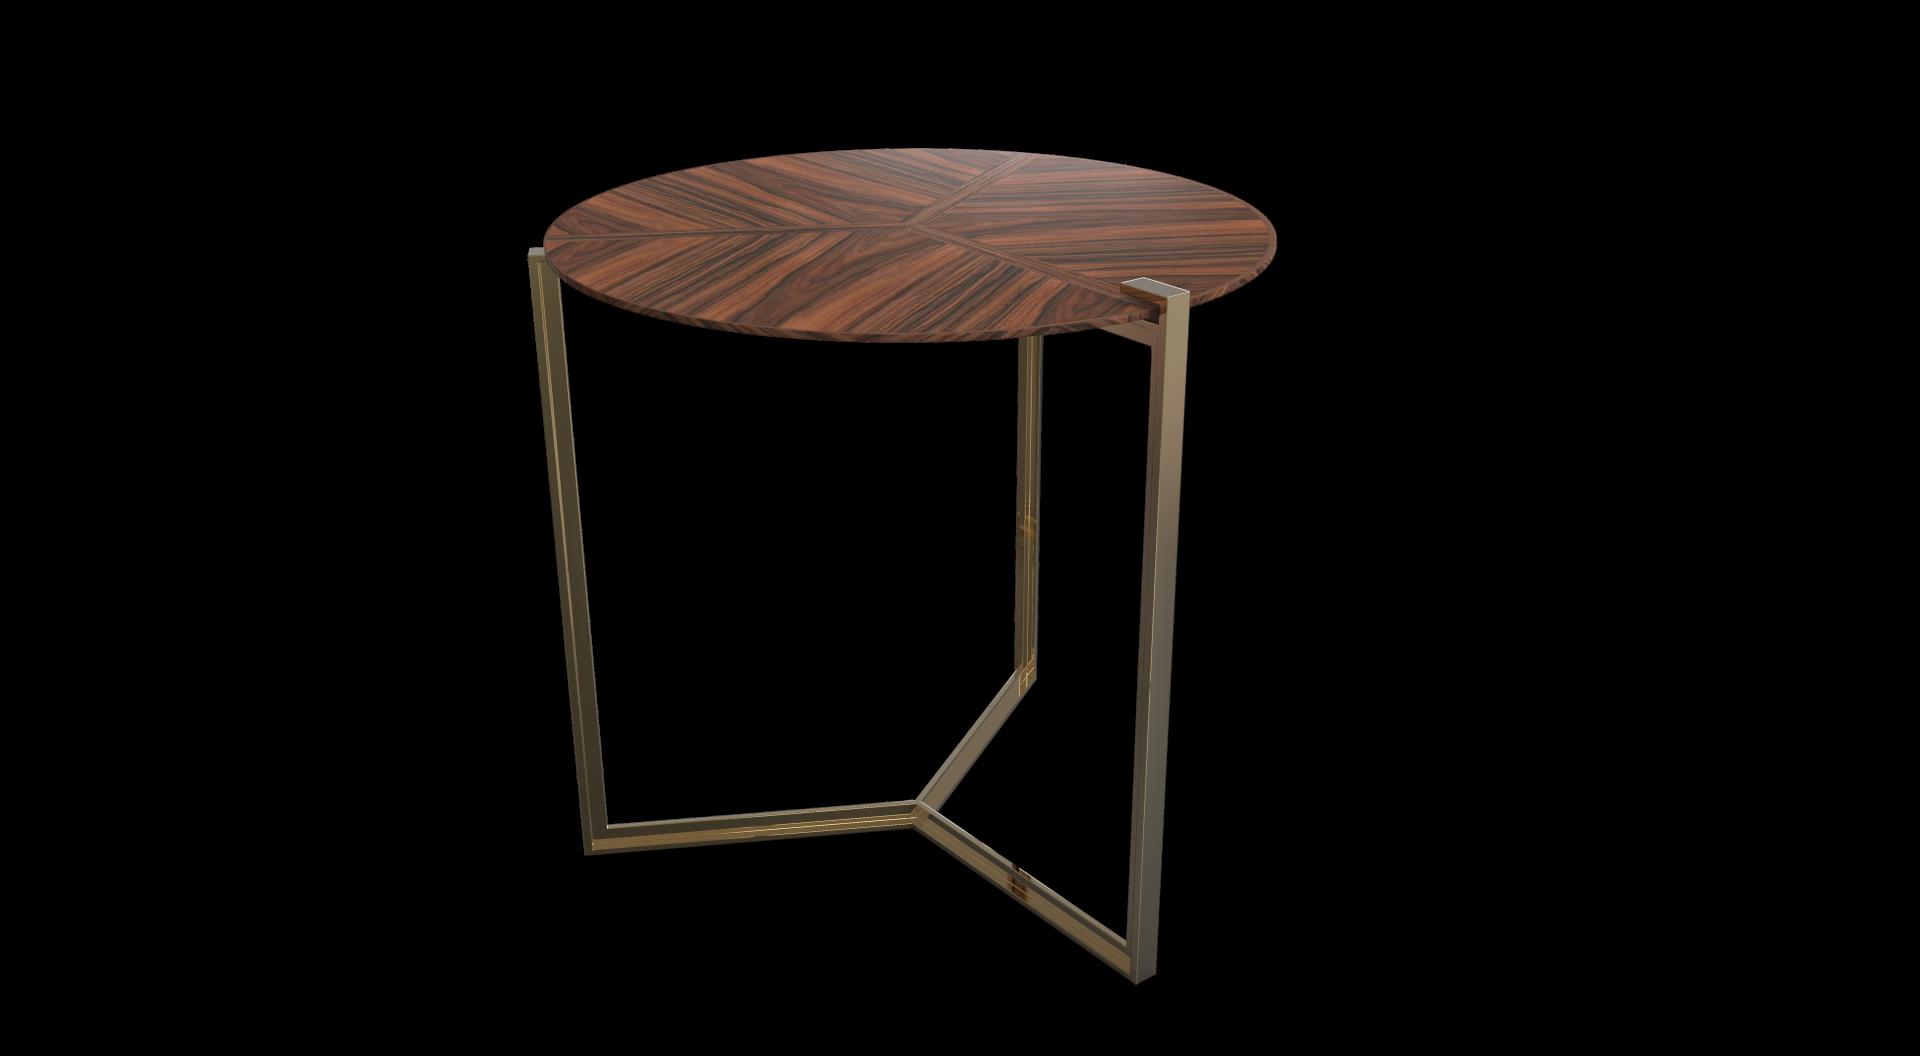 Ypsilon Side Table Dimensions